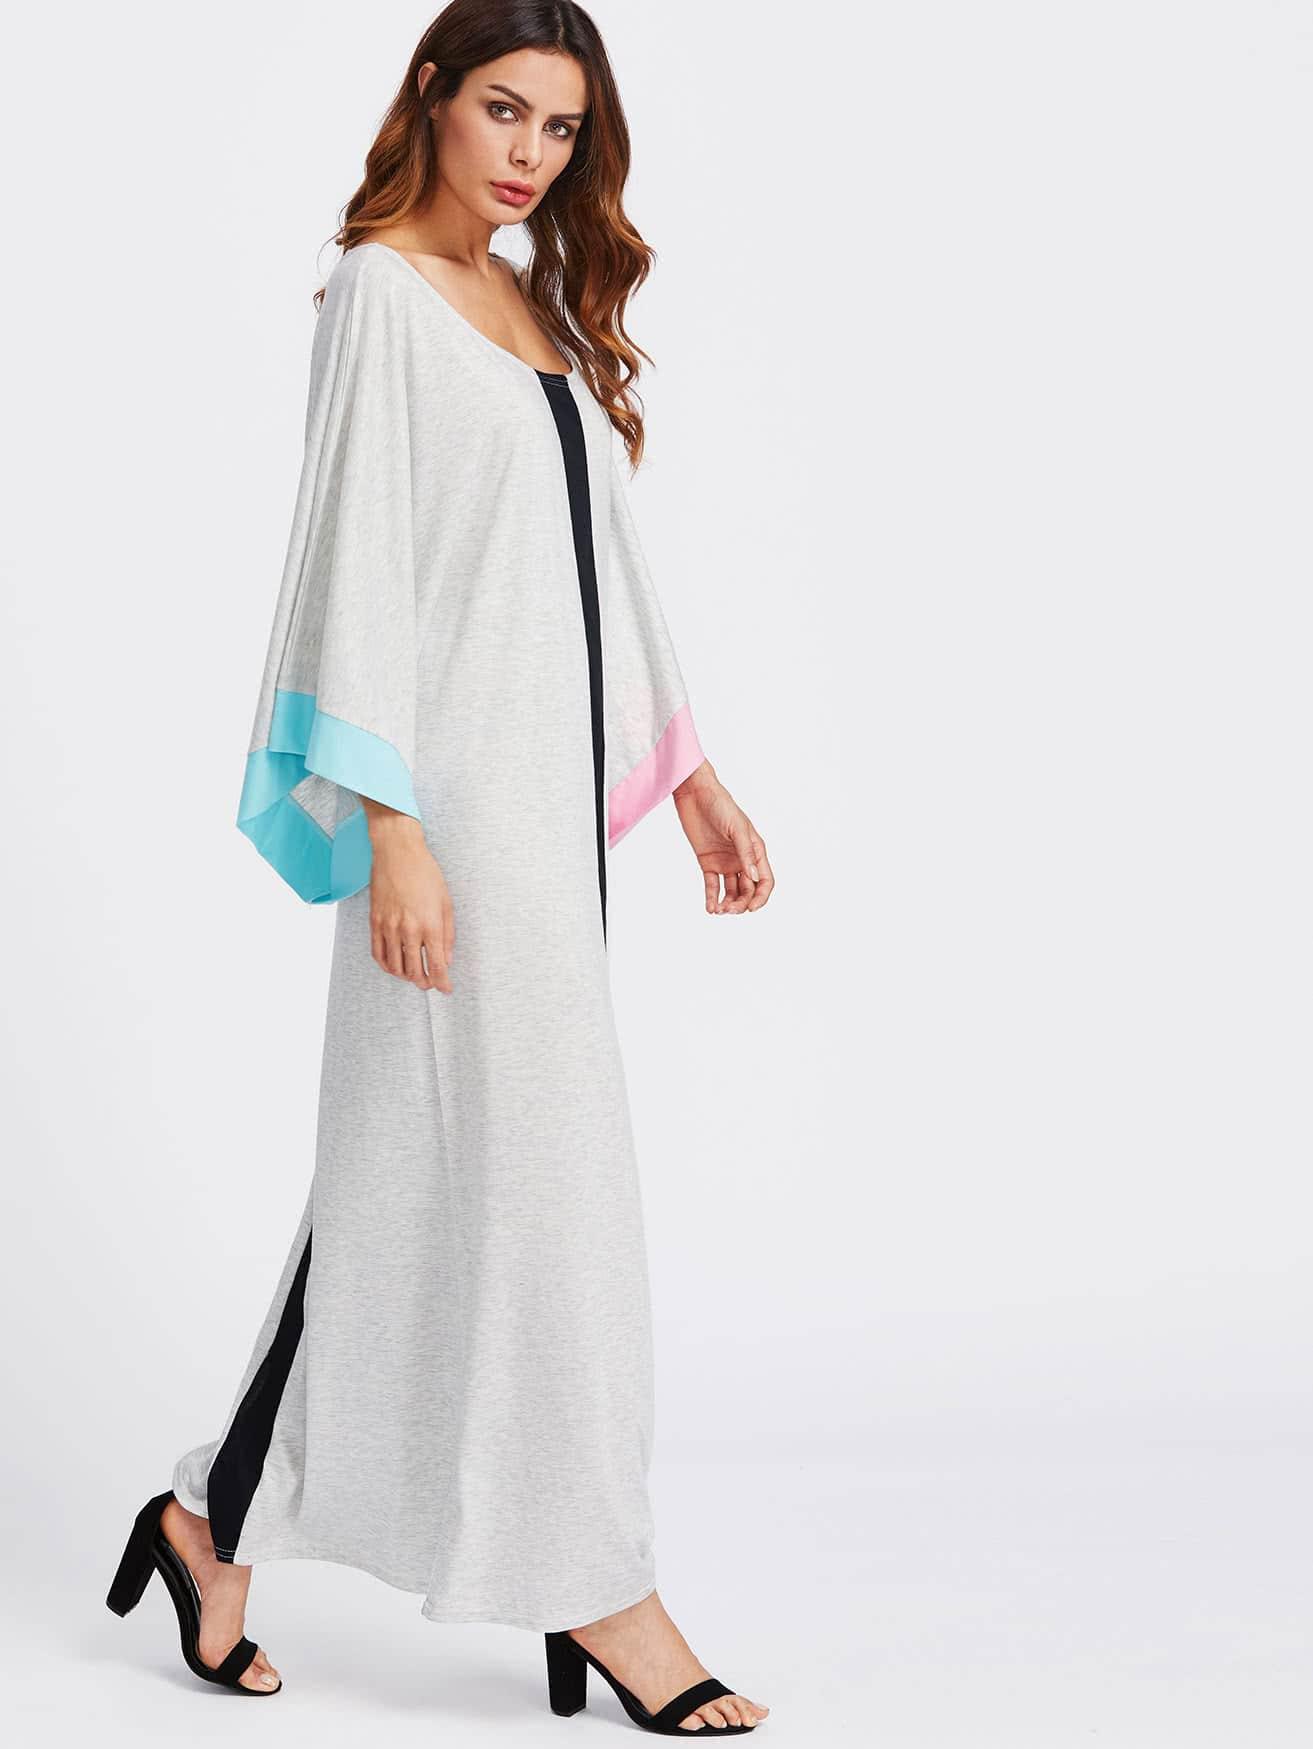 Contrast Panel Kimono Sleeve Full Length Dress contrast panel kimono sleeve kaftan dress